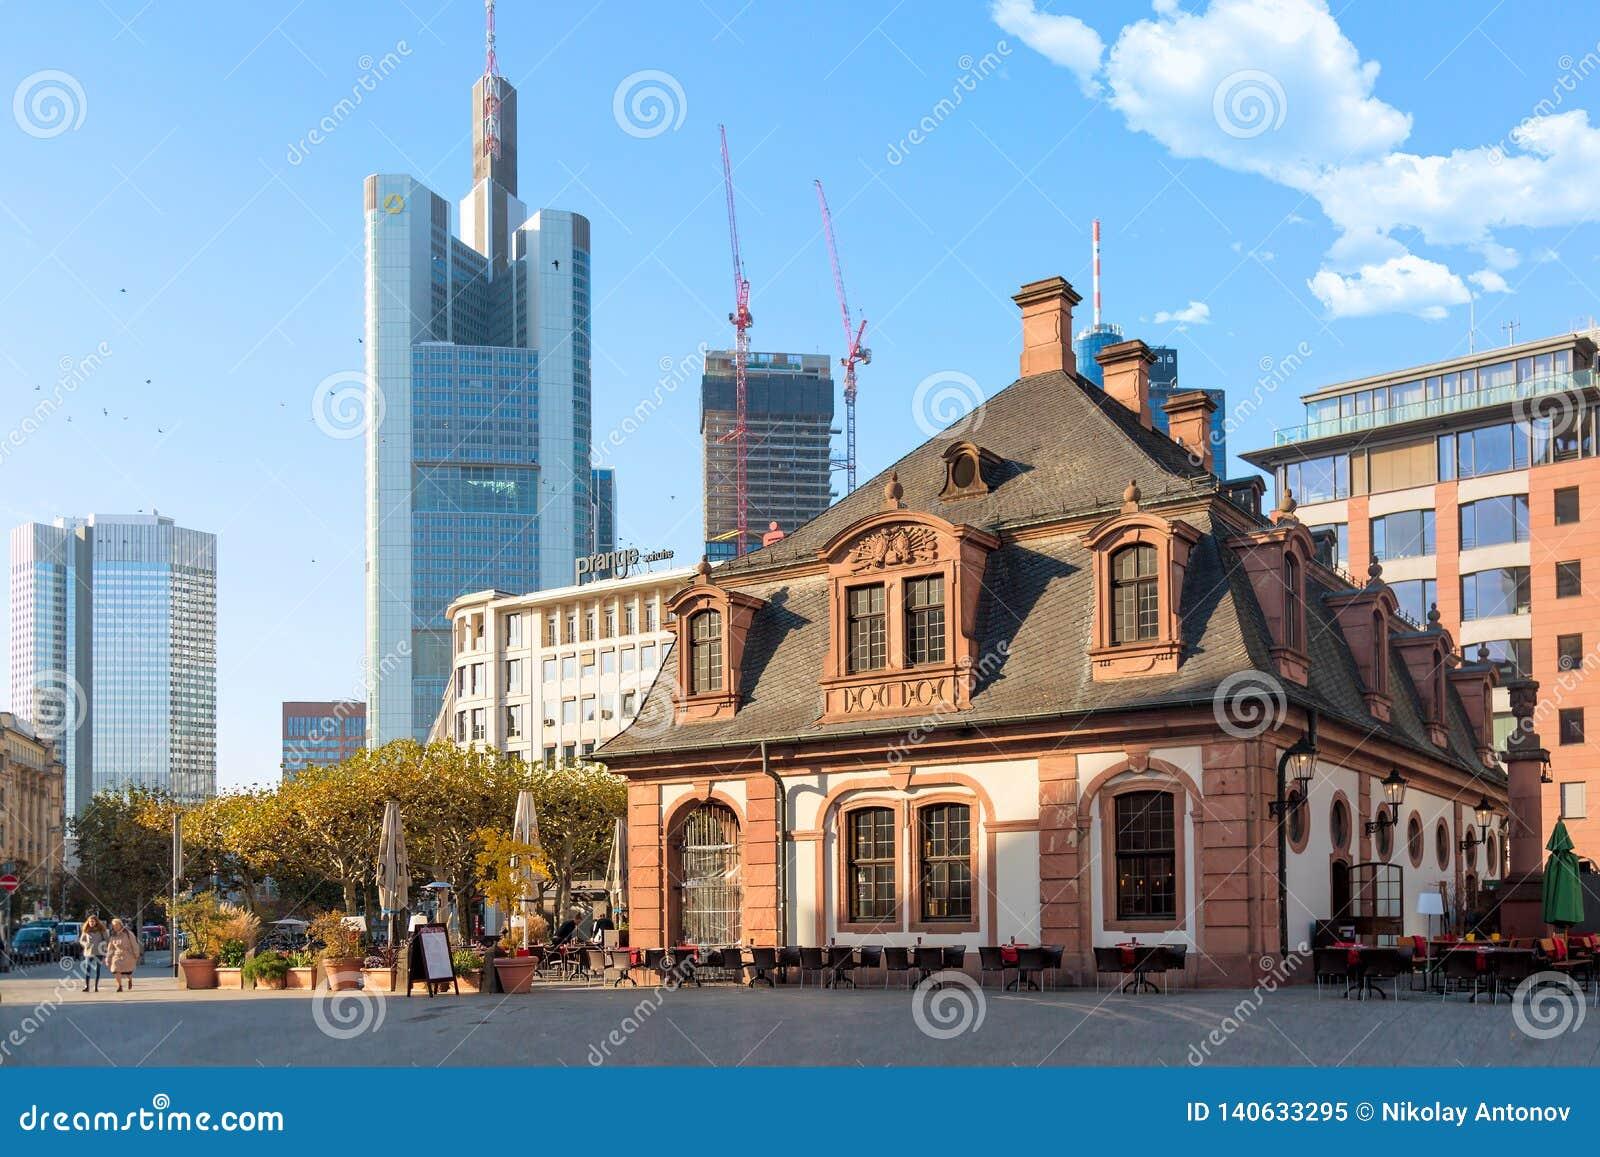 Frankfurt, Germany - November, 2018: Historic Hauptwache